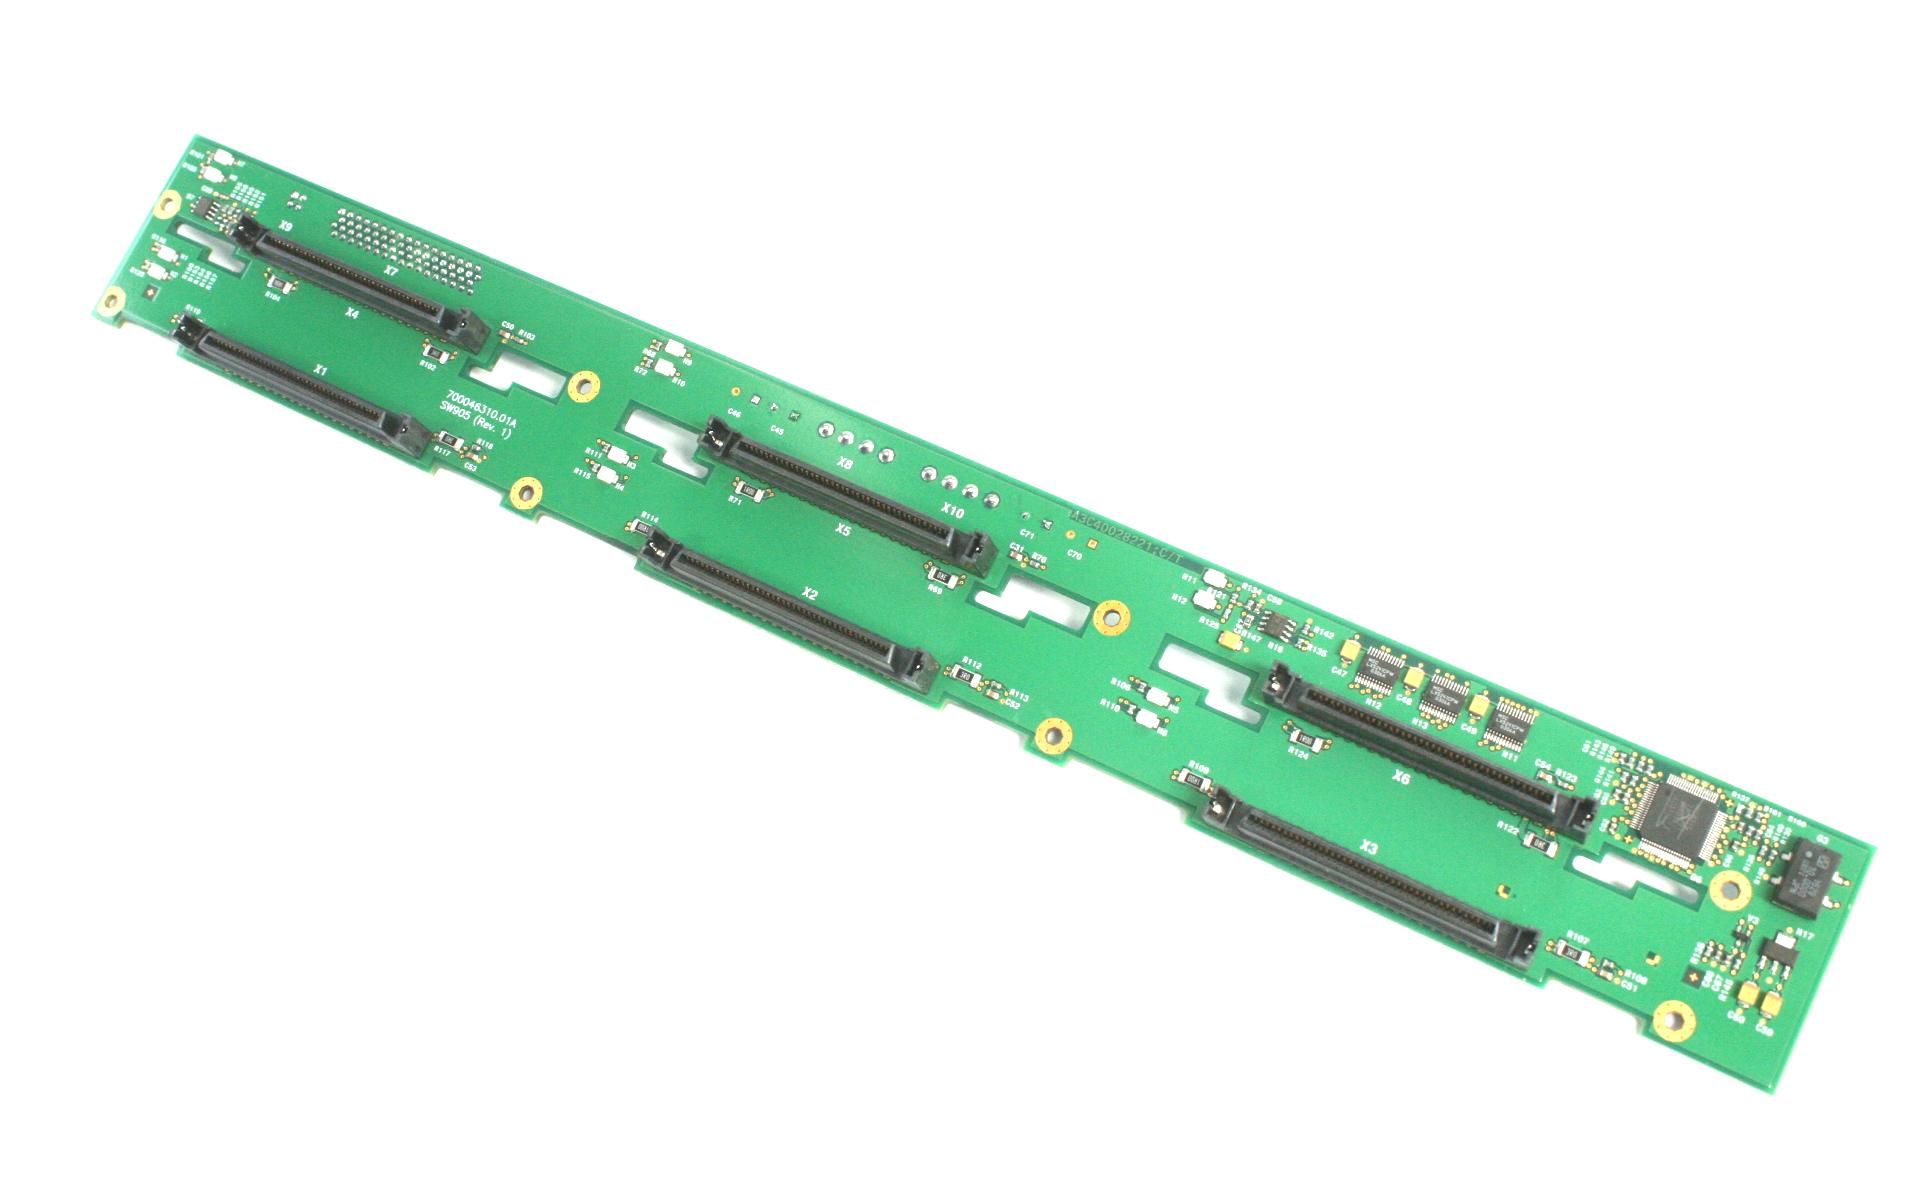 Fujitsu A3C40030650 SCSI Back-Plane 1X6 Kit - PCB P/N A3C40028222